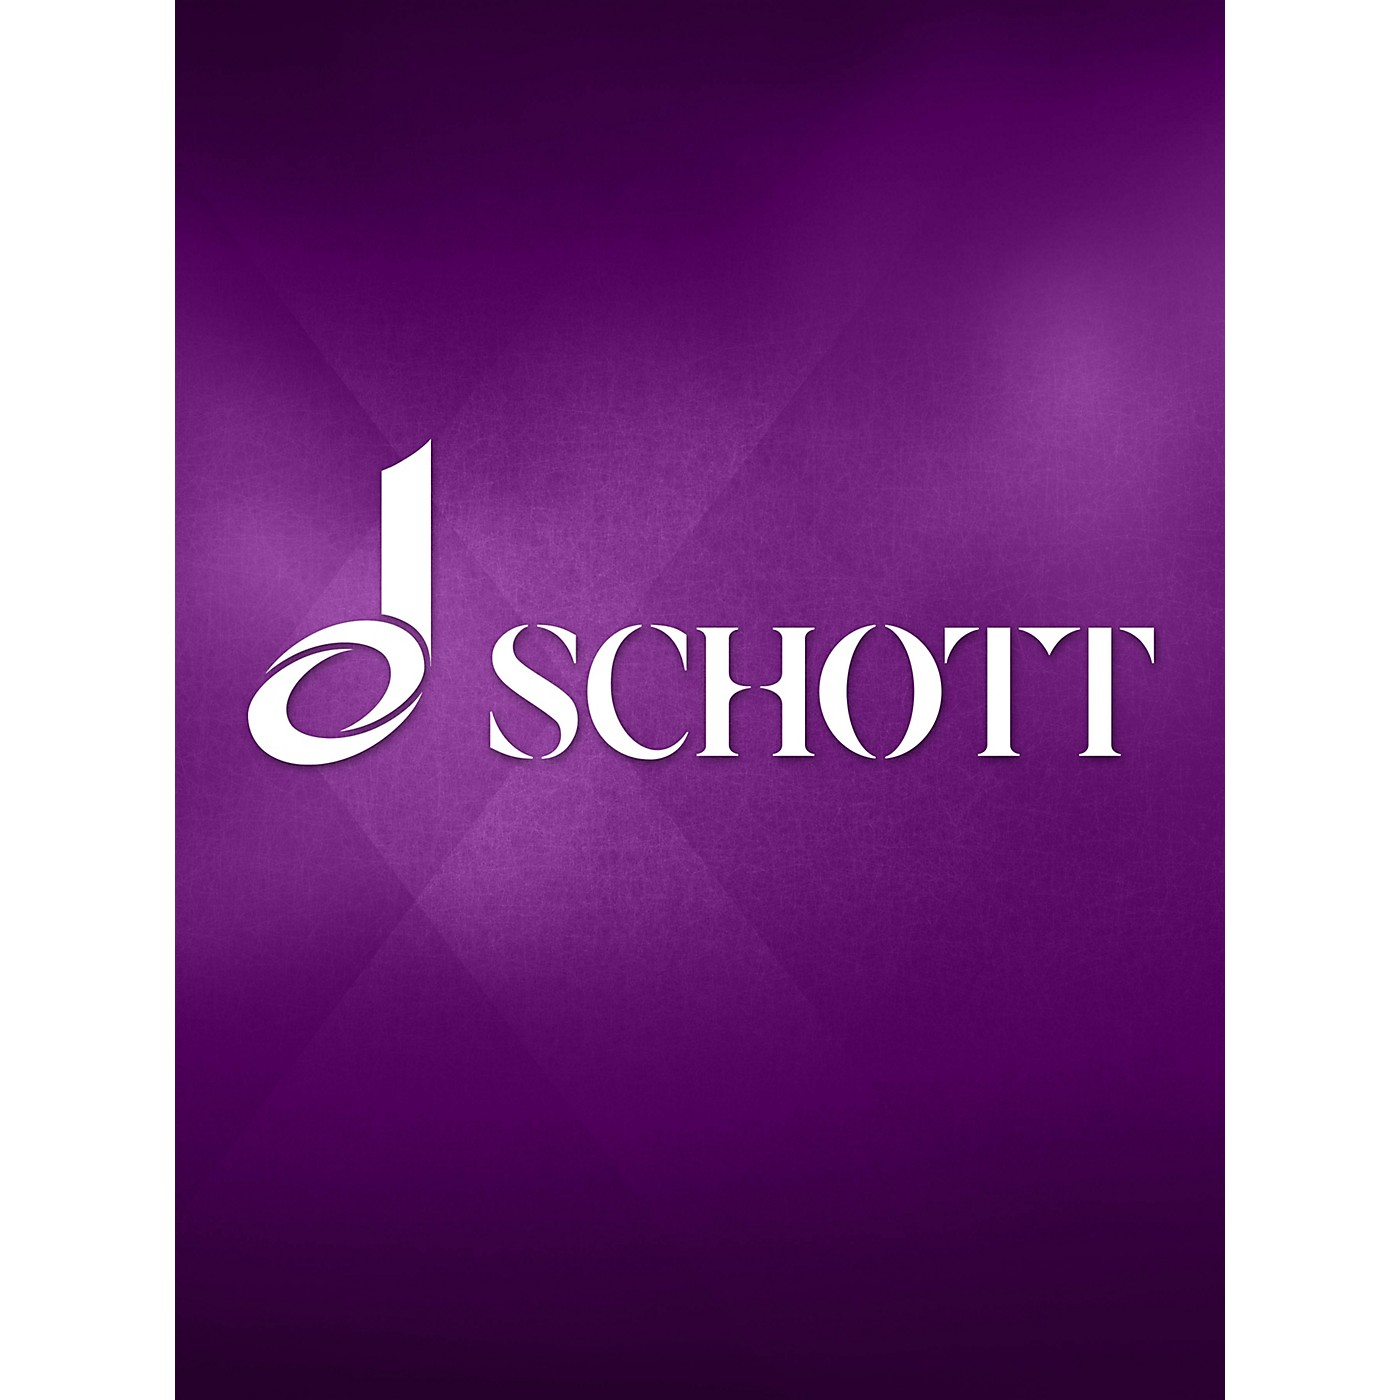 Schott Organ Conc 1 Op 4, No 1 G Min (Oboe 1 Part) Schott Series by Georg Friedrich Händel thumbnail